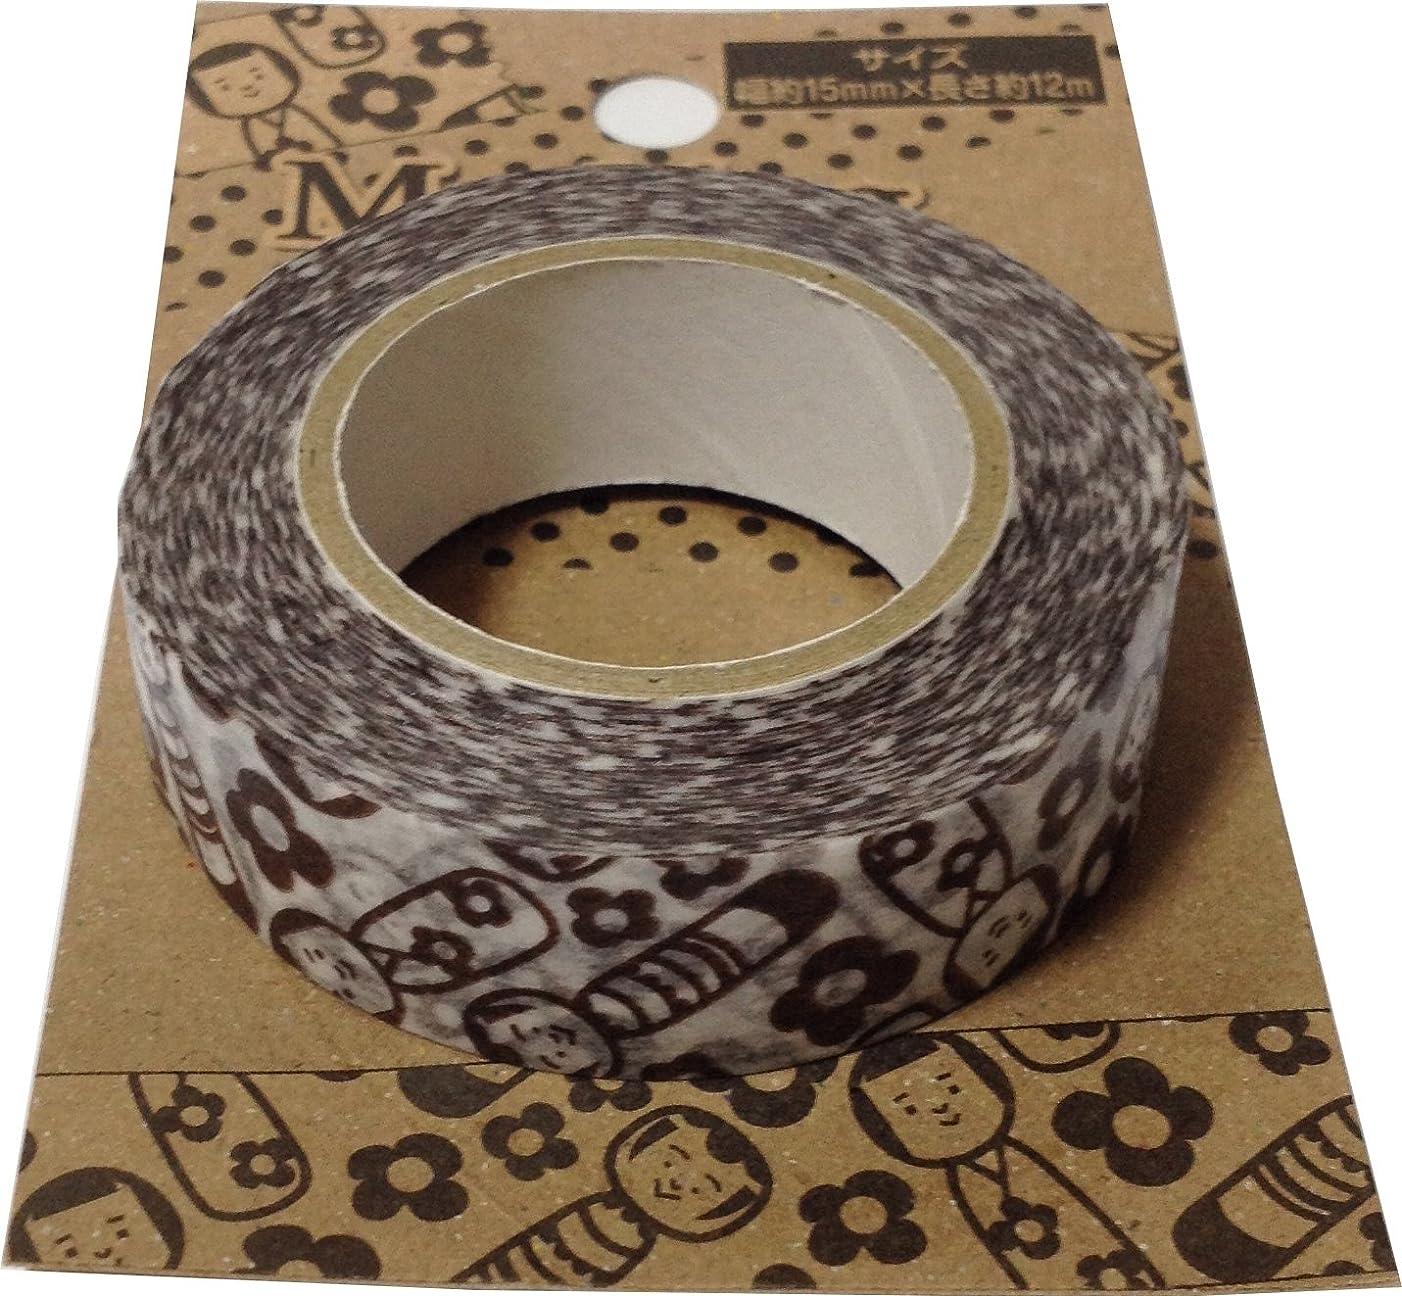 Washi Japanese Paper Masking Tape 12m Sticker Decoration Arts, Crafts & Sewing Stationery Japan (Kokeshi)